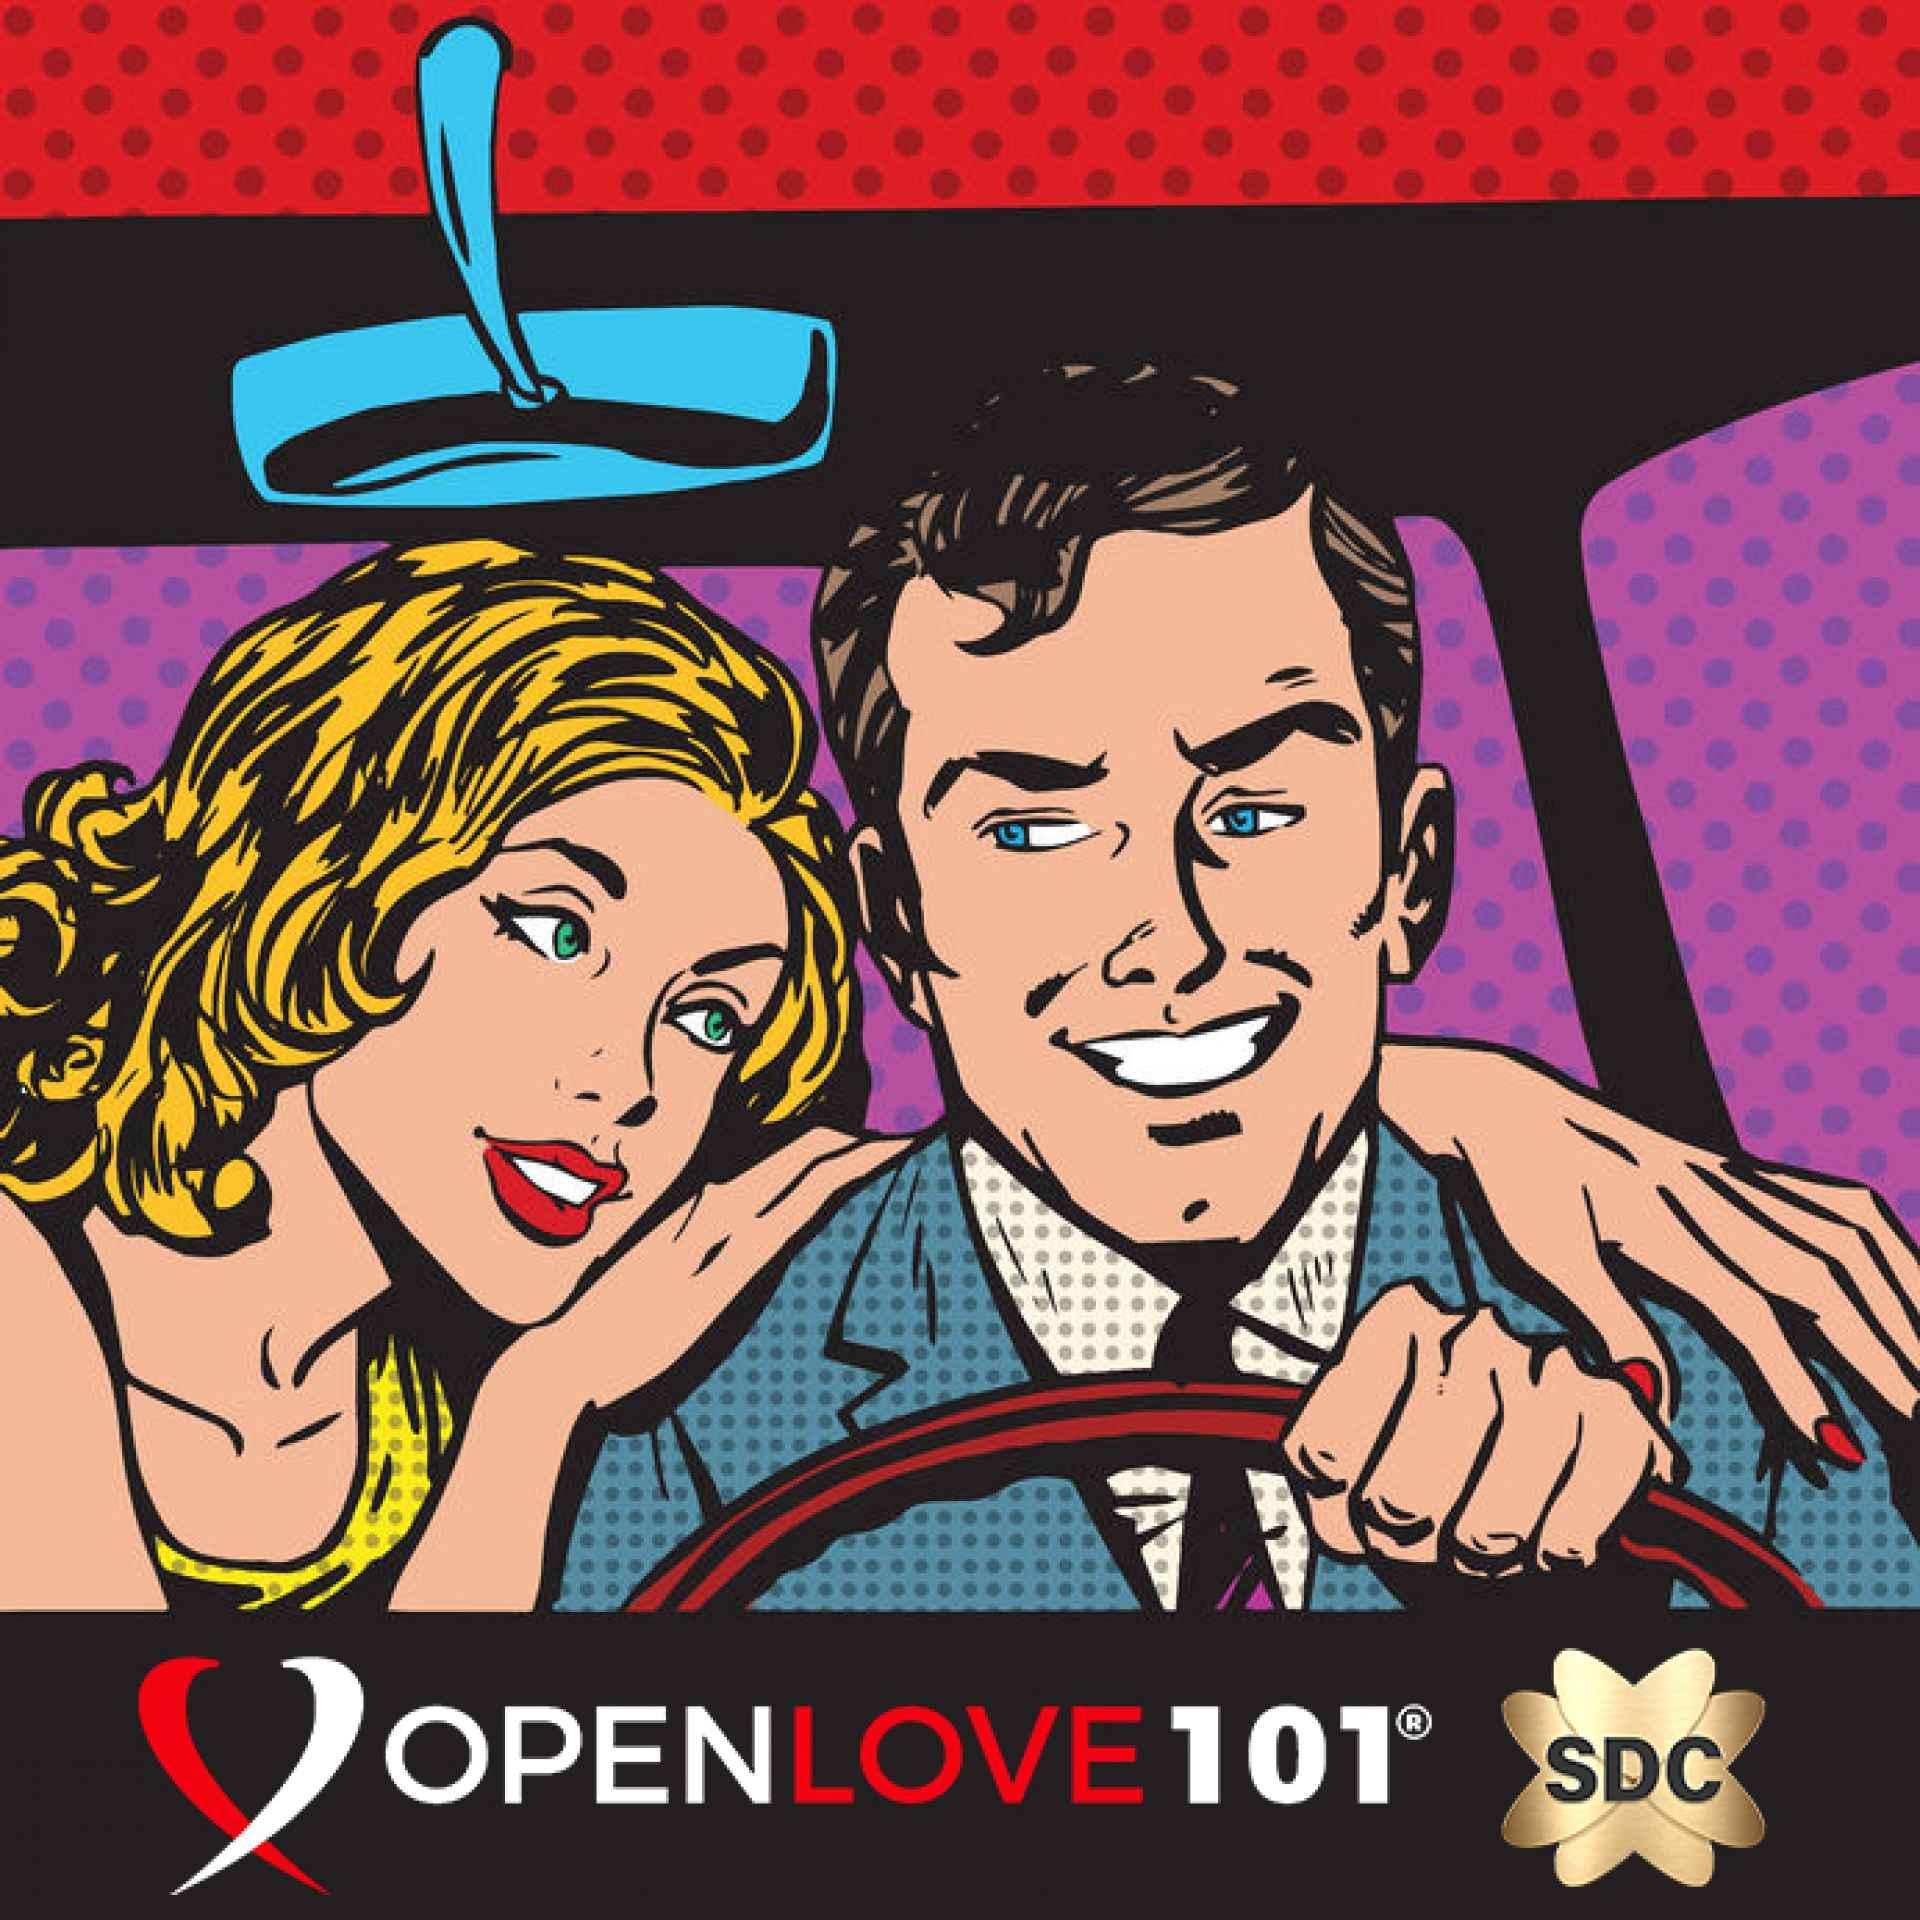 Openlove 101 SDC Beginner Lifestyle Clubgids Na